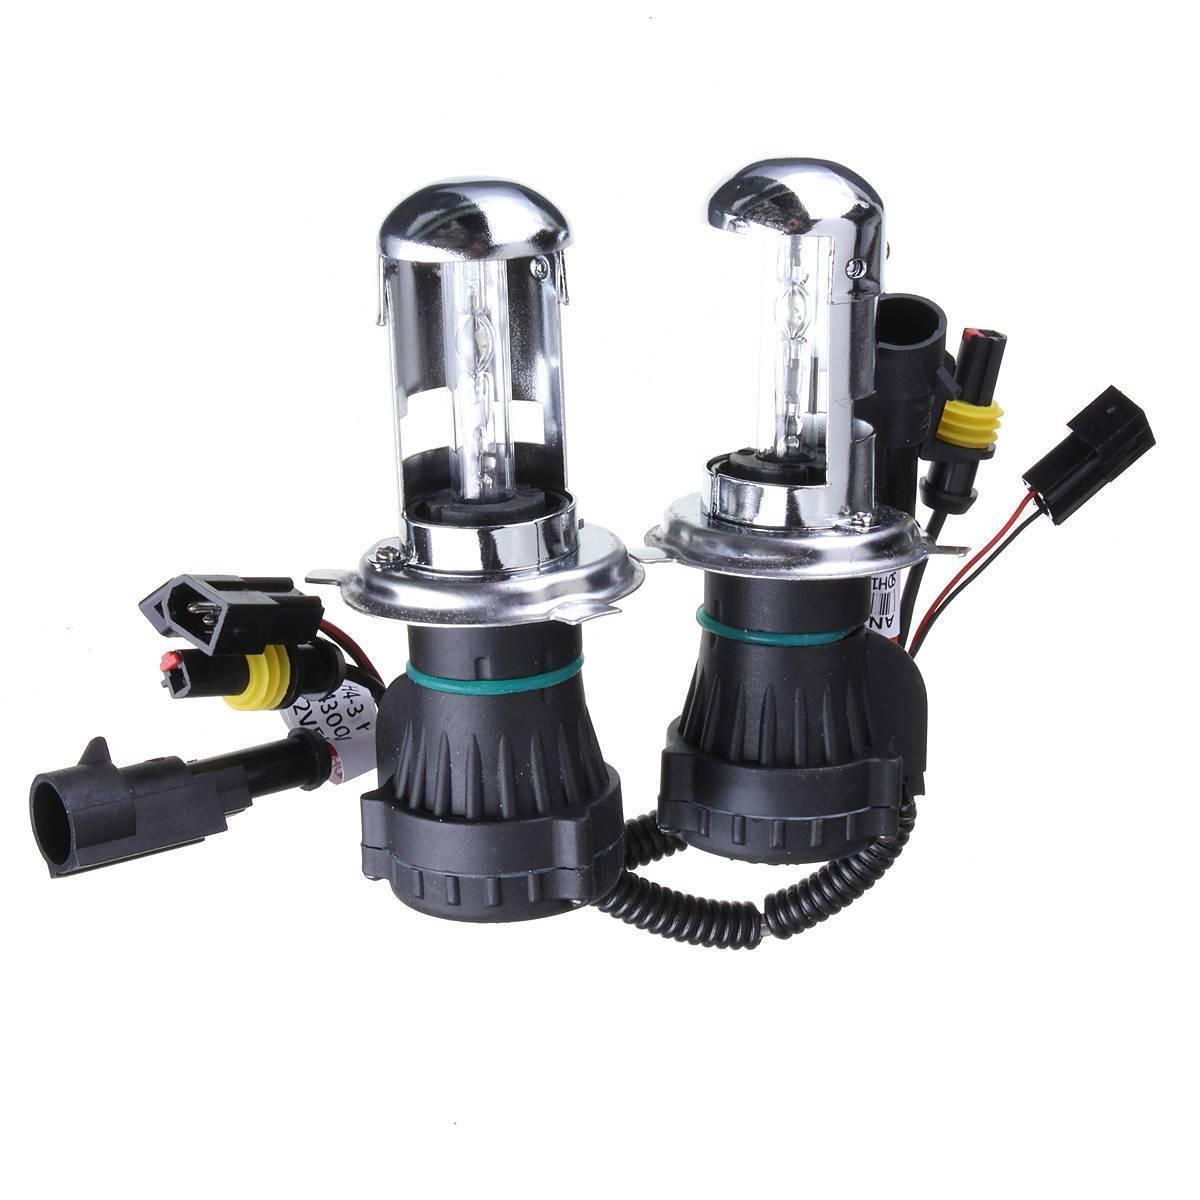 2X Bulb AUTO HID BI-Xenon Beam HI / LOW Bulb H4 (35W, 8000K) hot sale high quality auto xenon hid conversion kit 12v 35w h4 hi low dual beam 10000k freeshipping